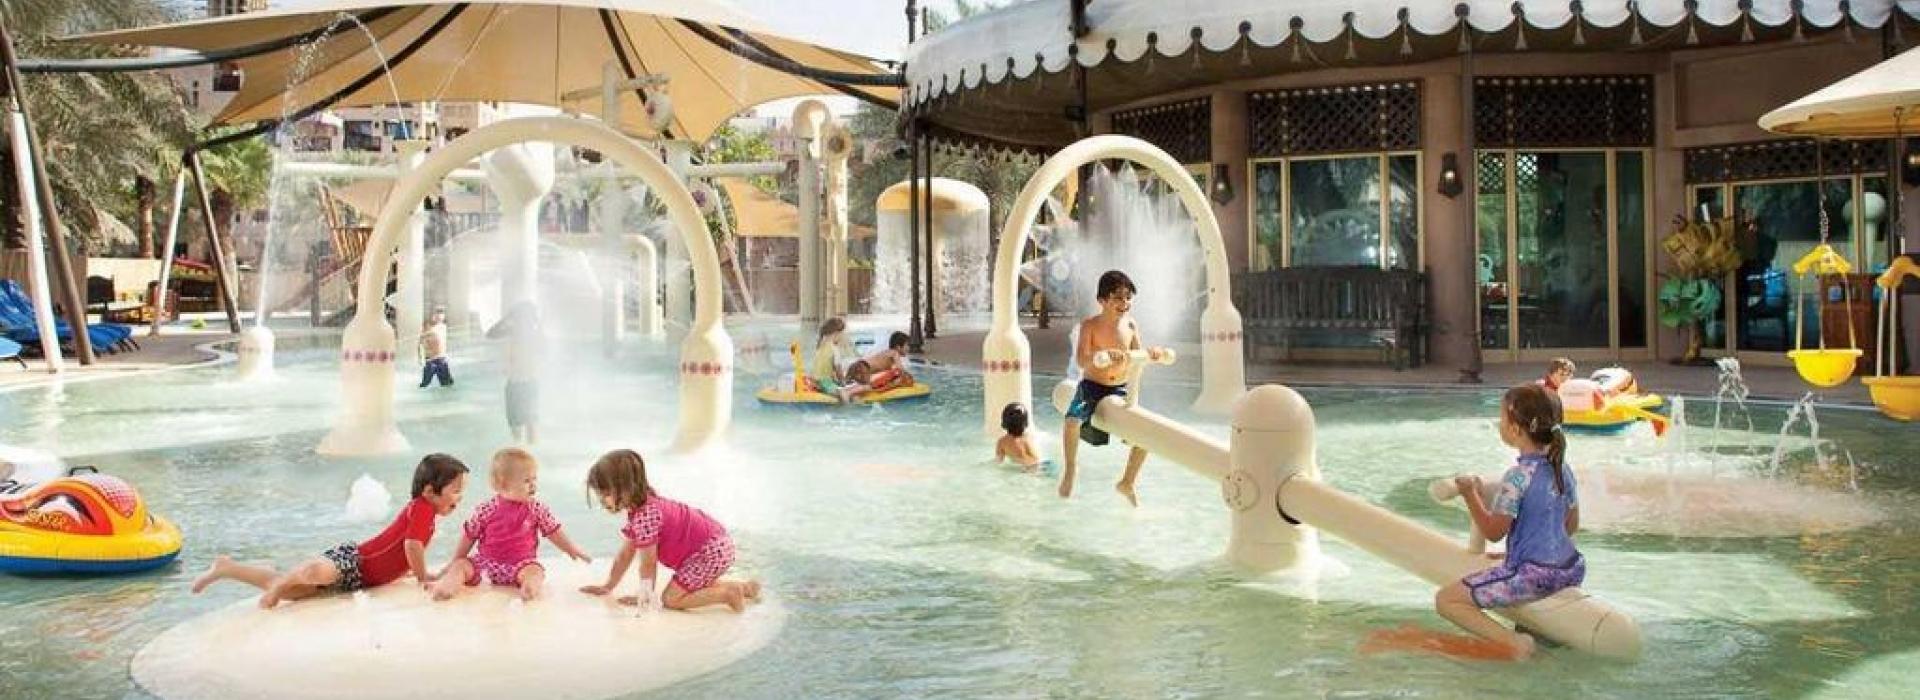 Jumeirah Beach Hotel 5*Deluxe